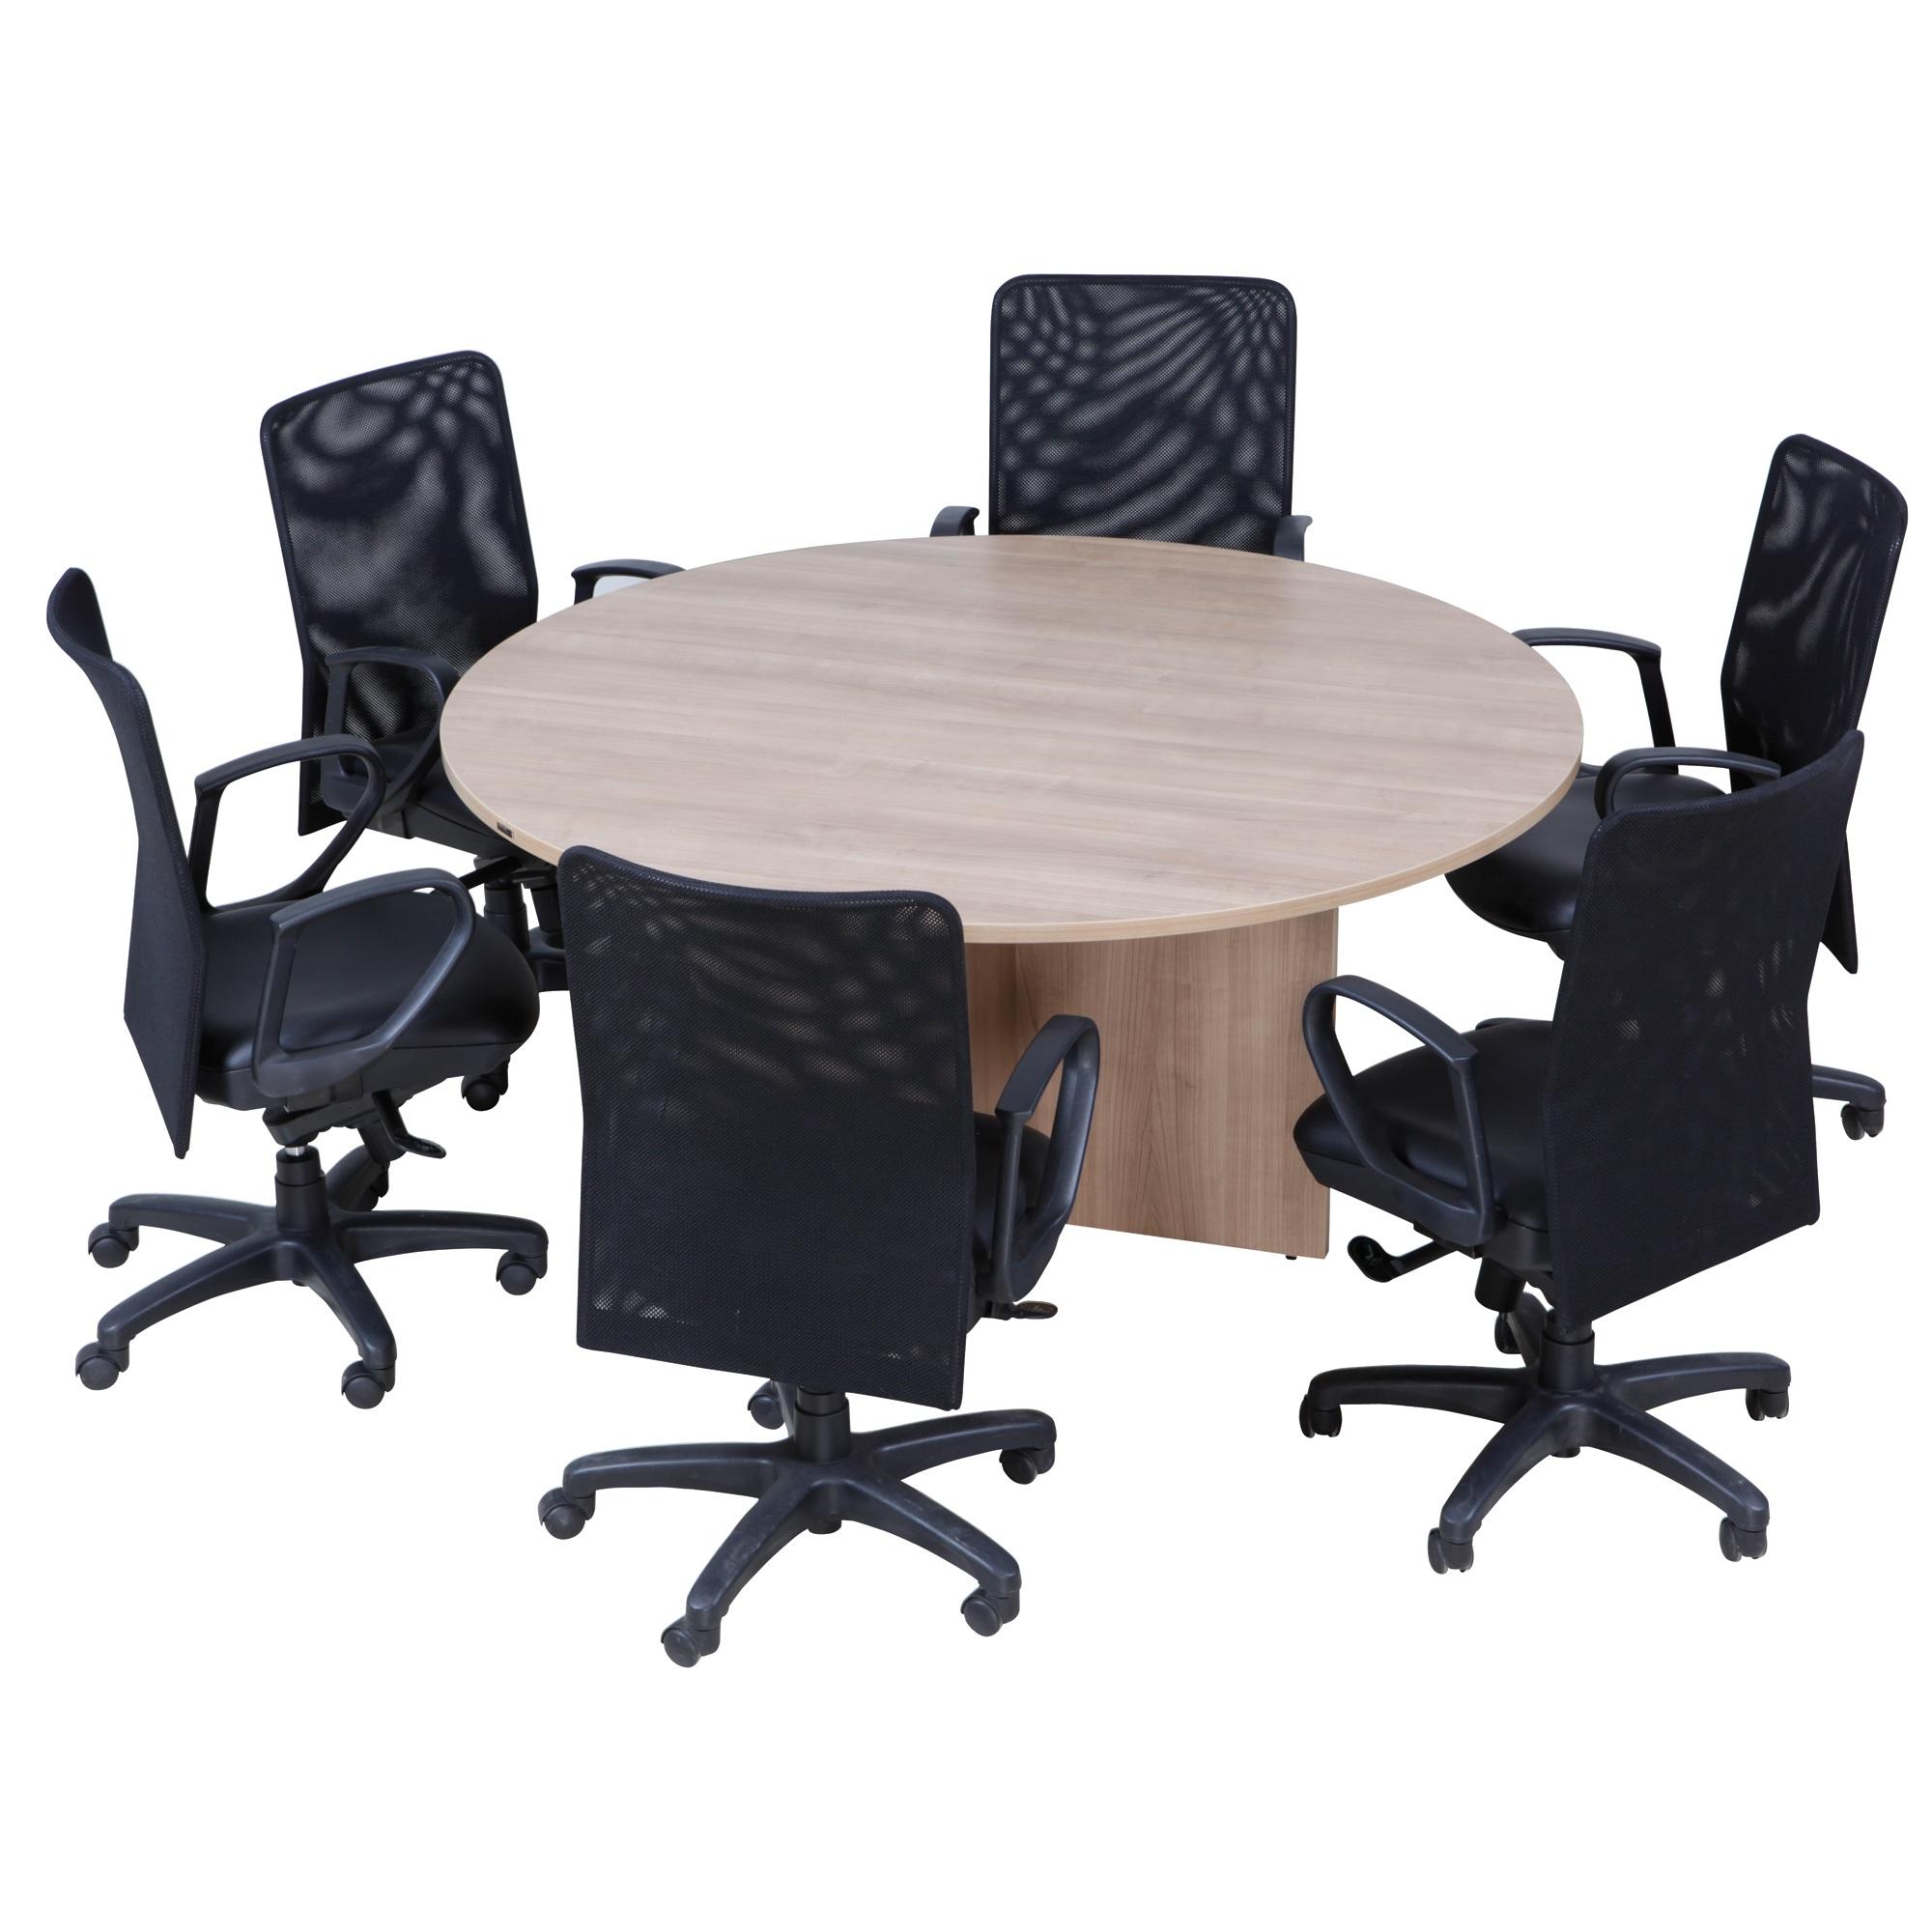 Furradec RST Round Meeting Table Seat Light Oak Conference Table - Round conference table for 6